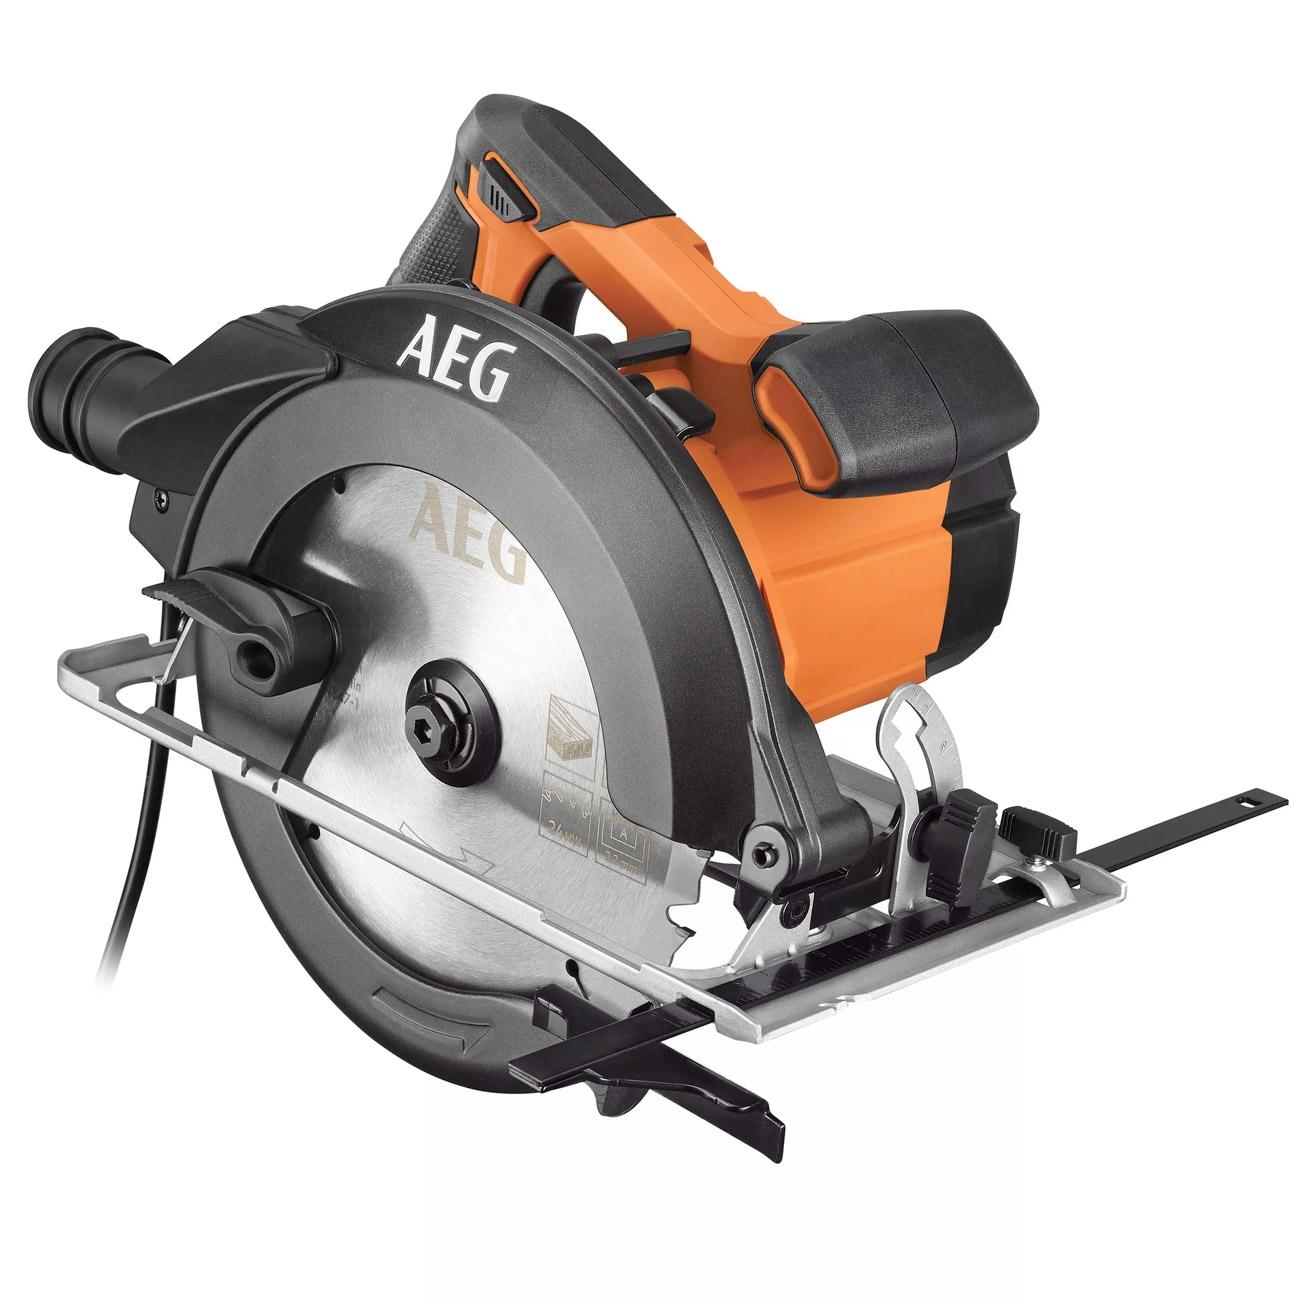 AEG KS12-1 Circular saw for wood